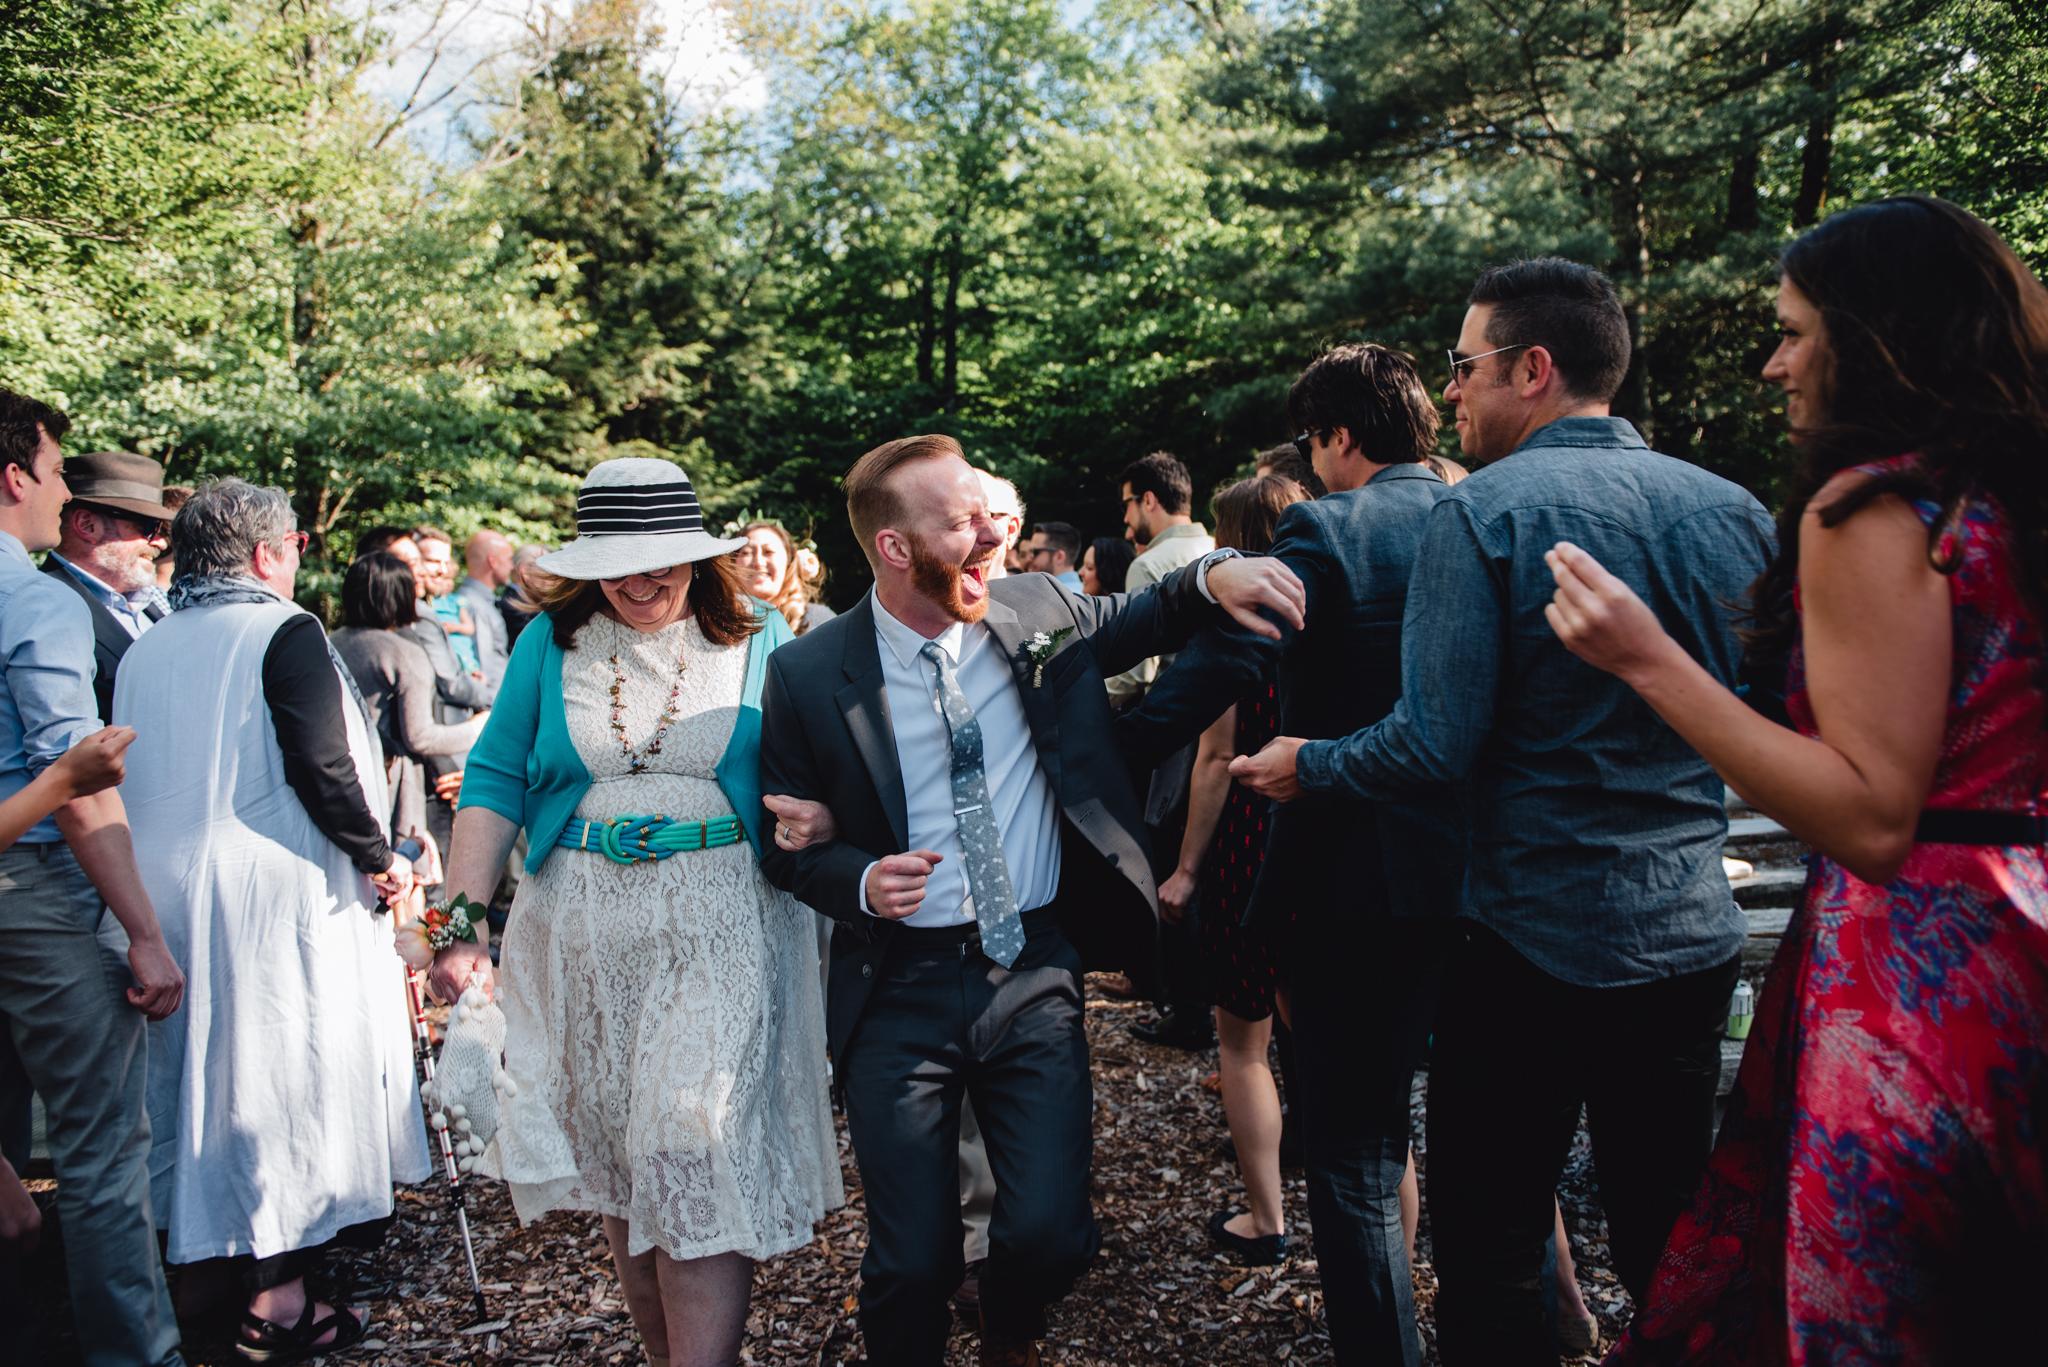 Summer Camp Wedding Photography June 2017 Massachusetts Berkshires Outdoor Wedding Photography Novella Photography Matt and Paulette Griswold (76).jpg